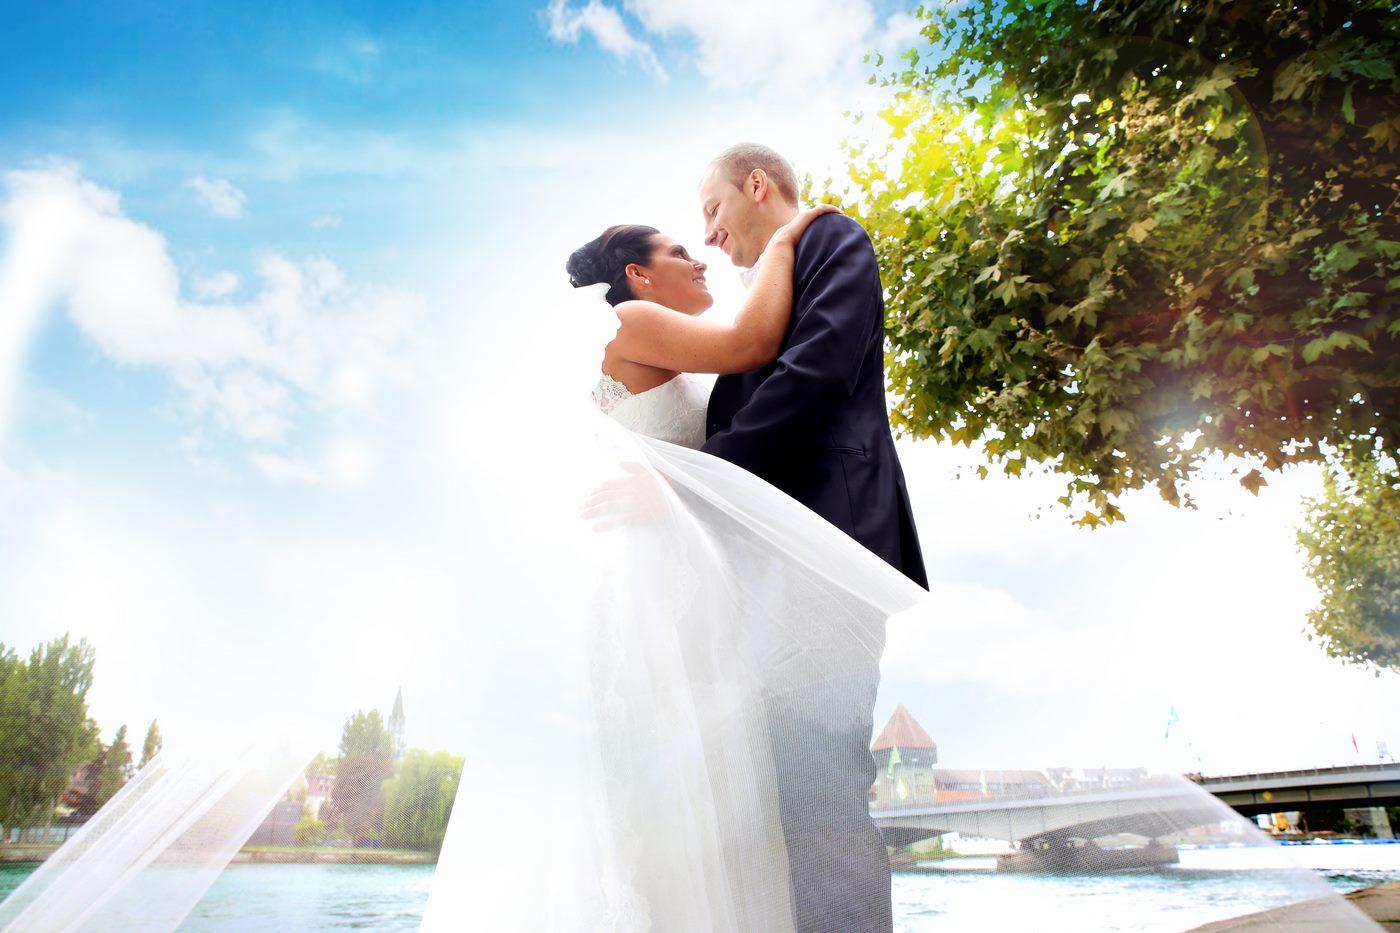 Brautpaar in Konstanz am Bodensee fotografiert